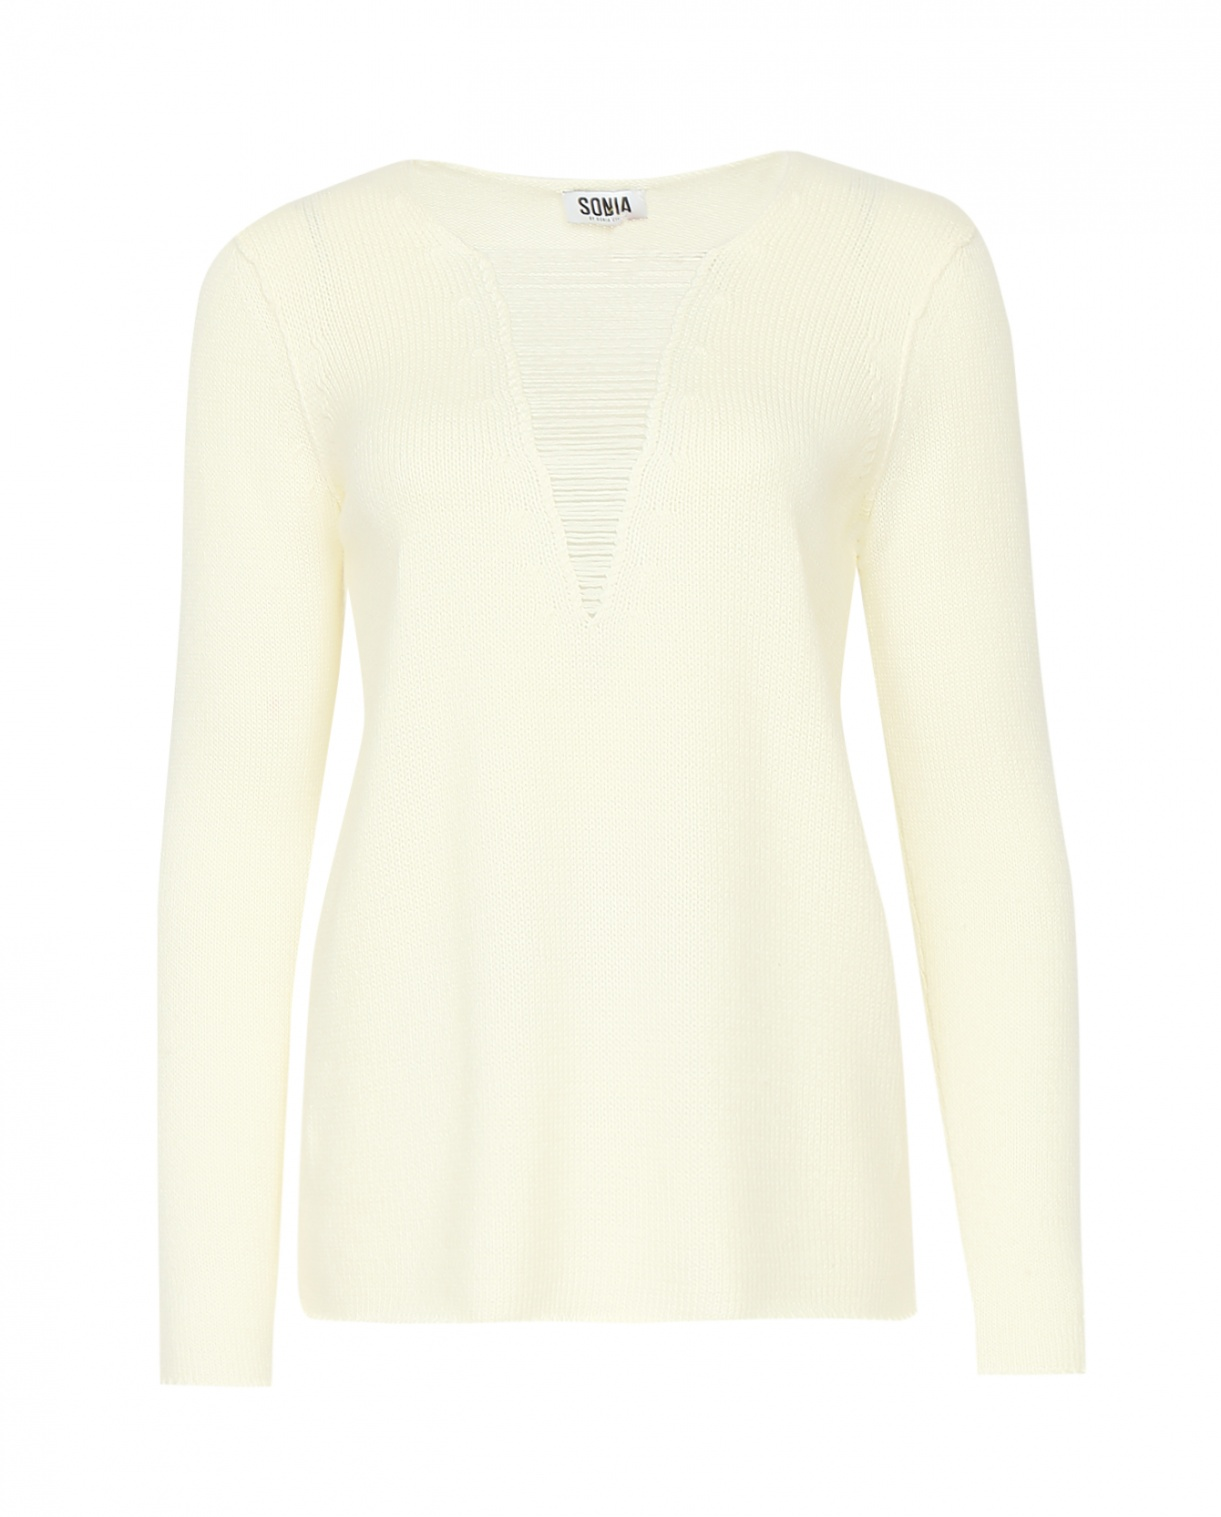 Джемпер из шерсти с декоративной вставкой на груди Sonia By Sonia Rykiel  –  Общий вид